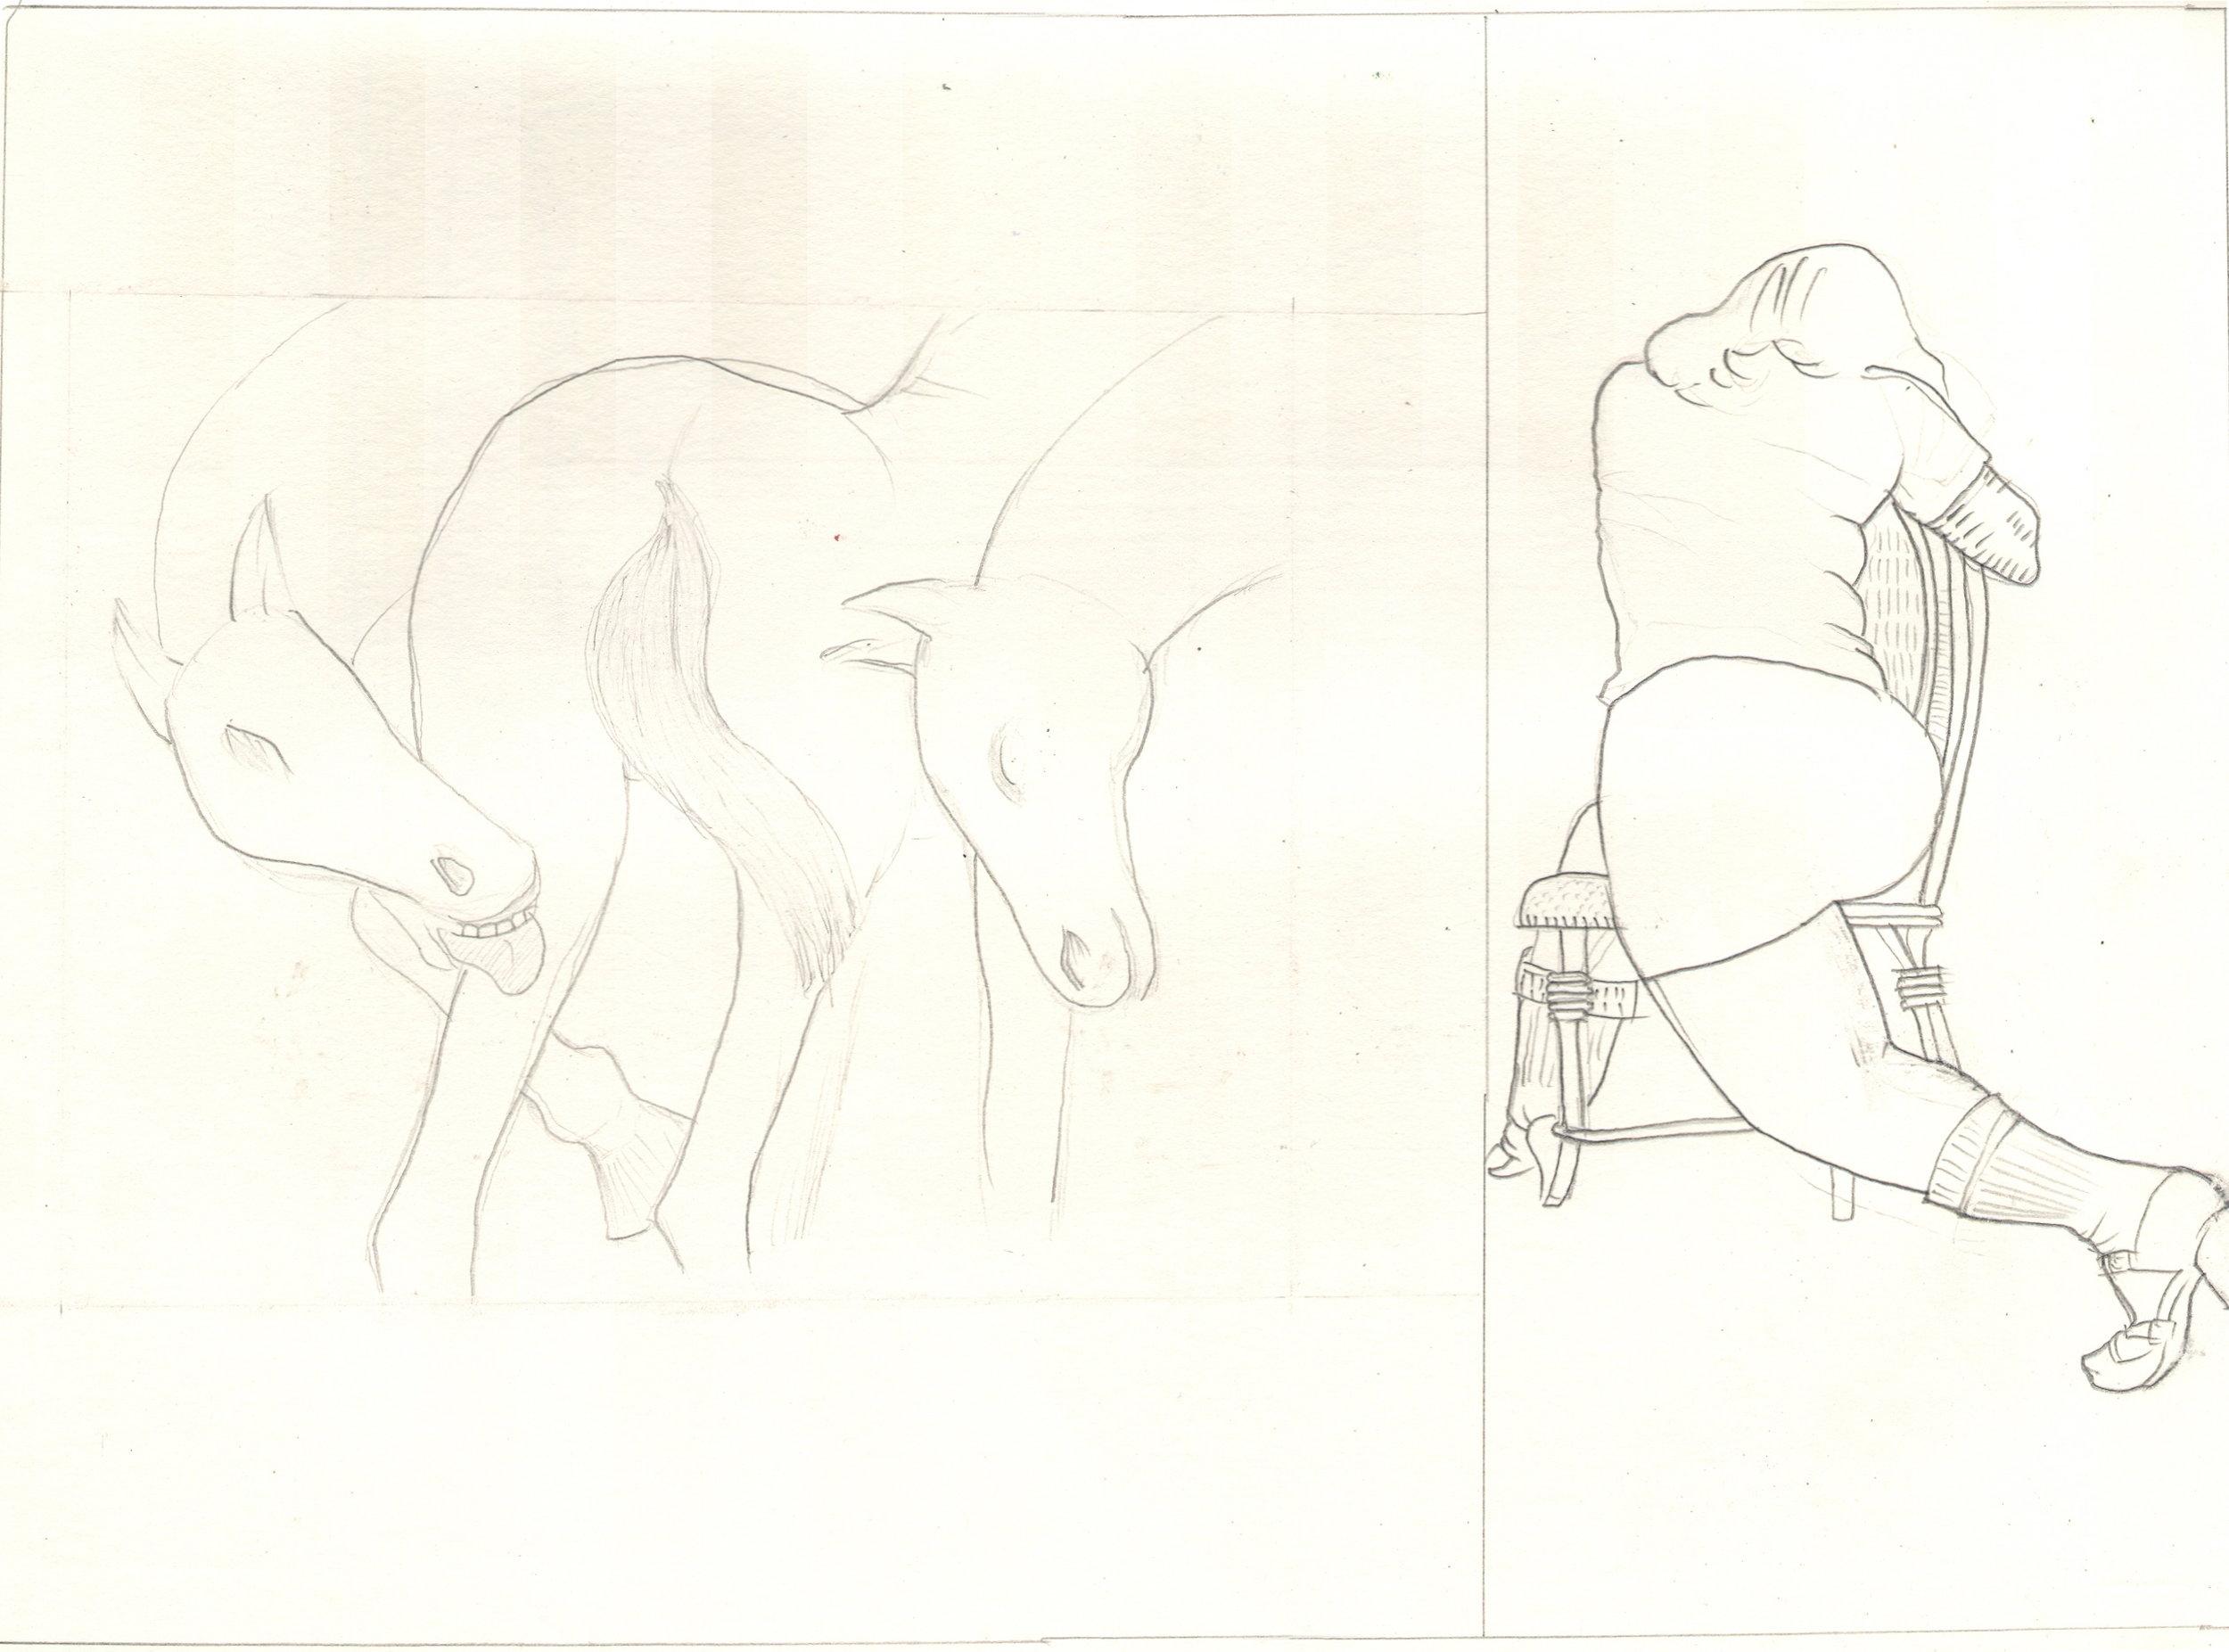 O.T. ( Serie Das Duell III Pierre Klossowsi & Robert Crumb ), 2018  Bleistift auf Papier, 26x35.5cm